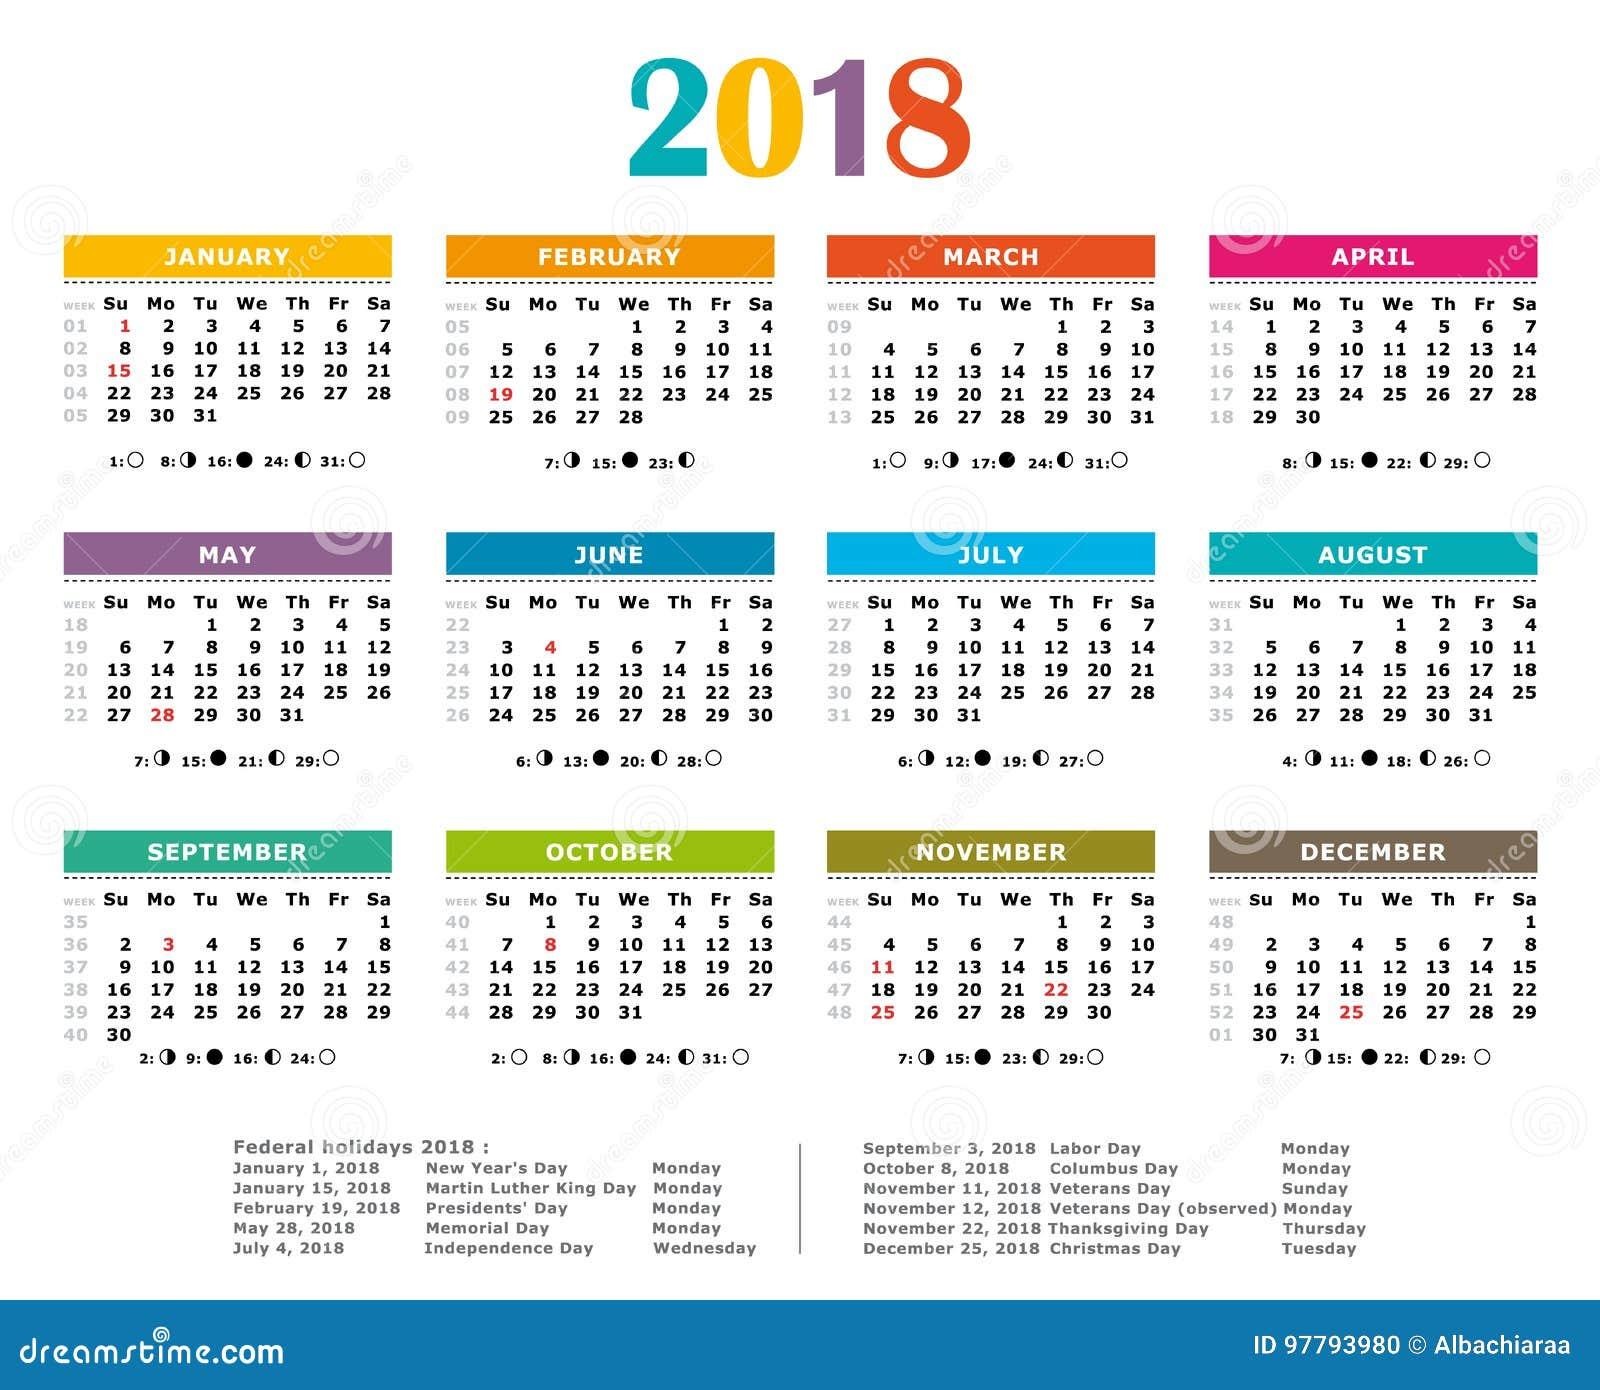 2018 Multicolor yearly calendar.